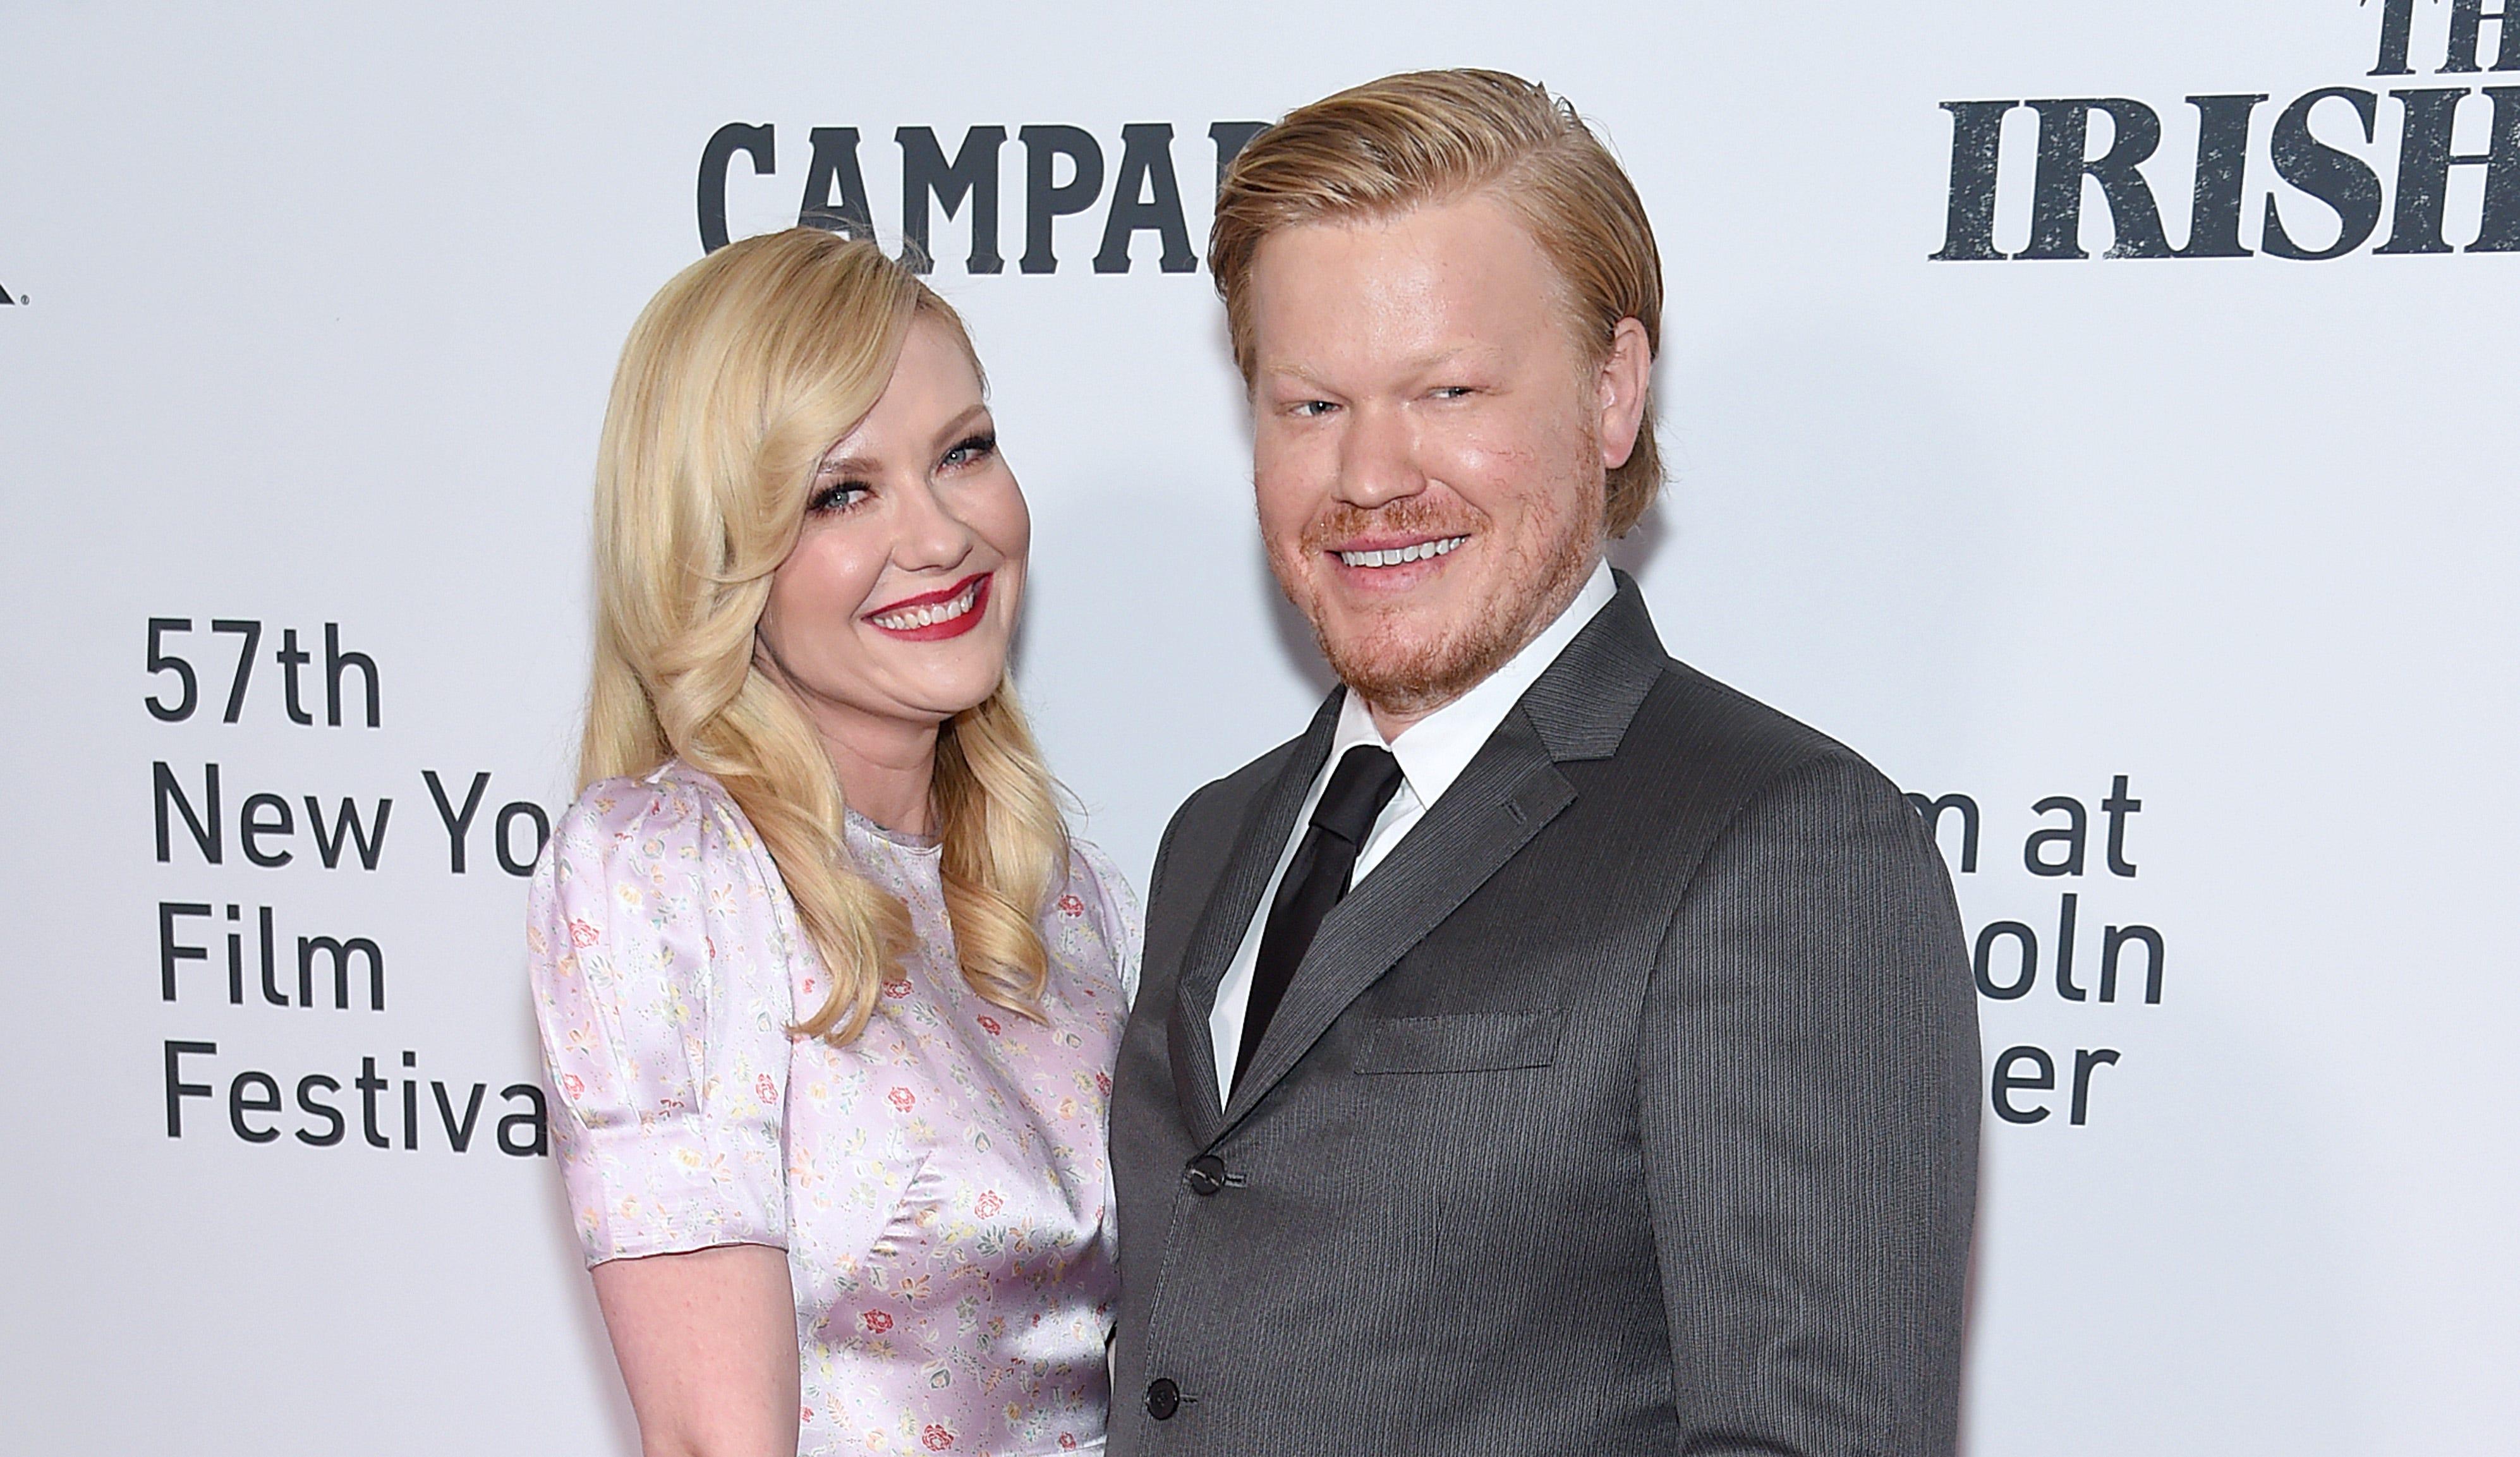 Kirsten Dunst, left, and husband Jesse Plemons in New York in 2019.